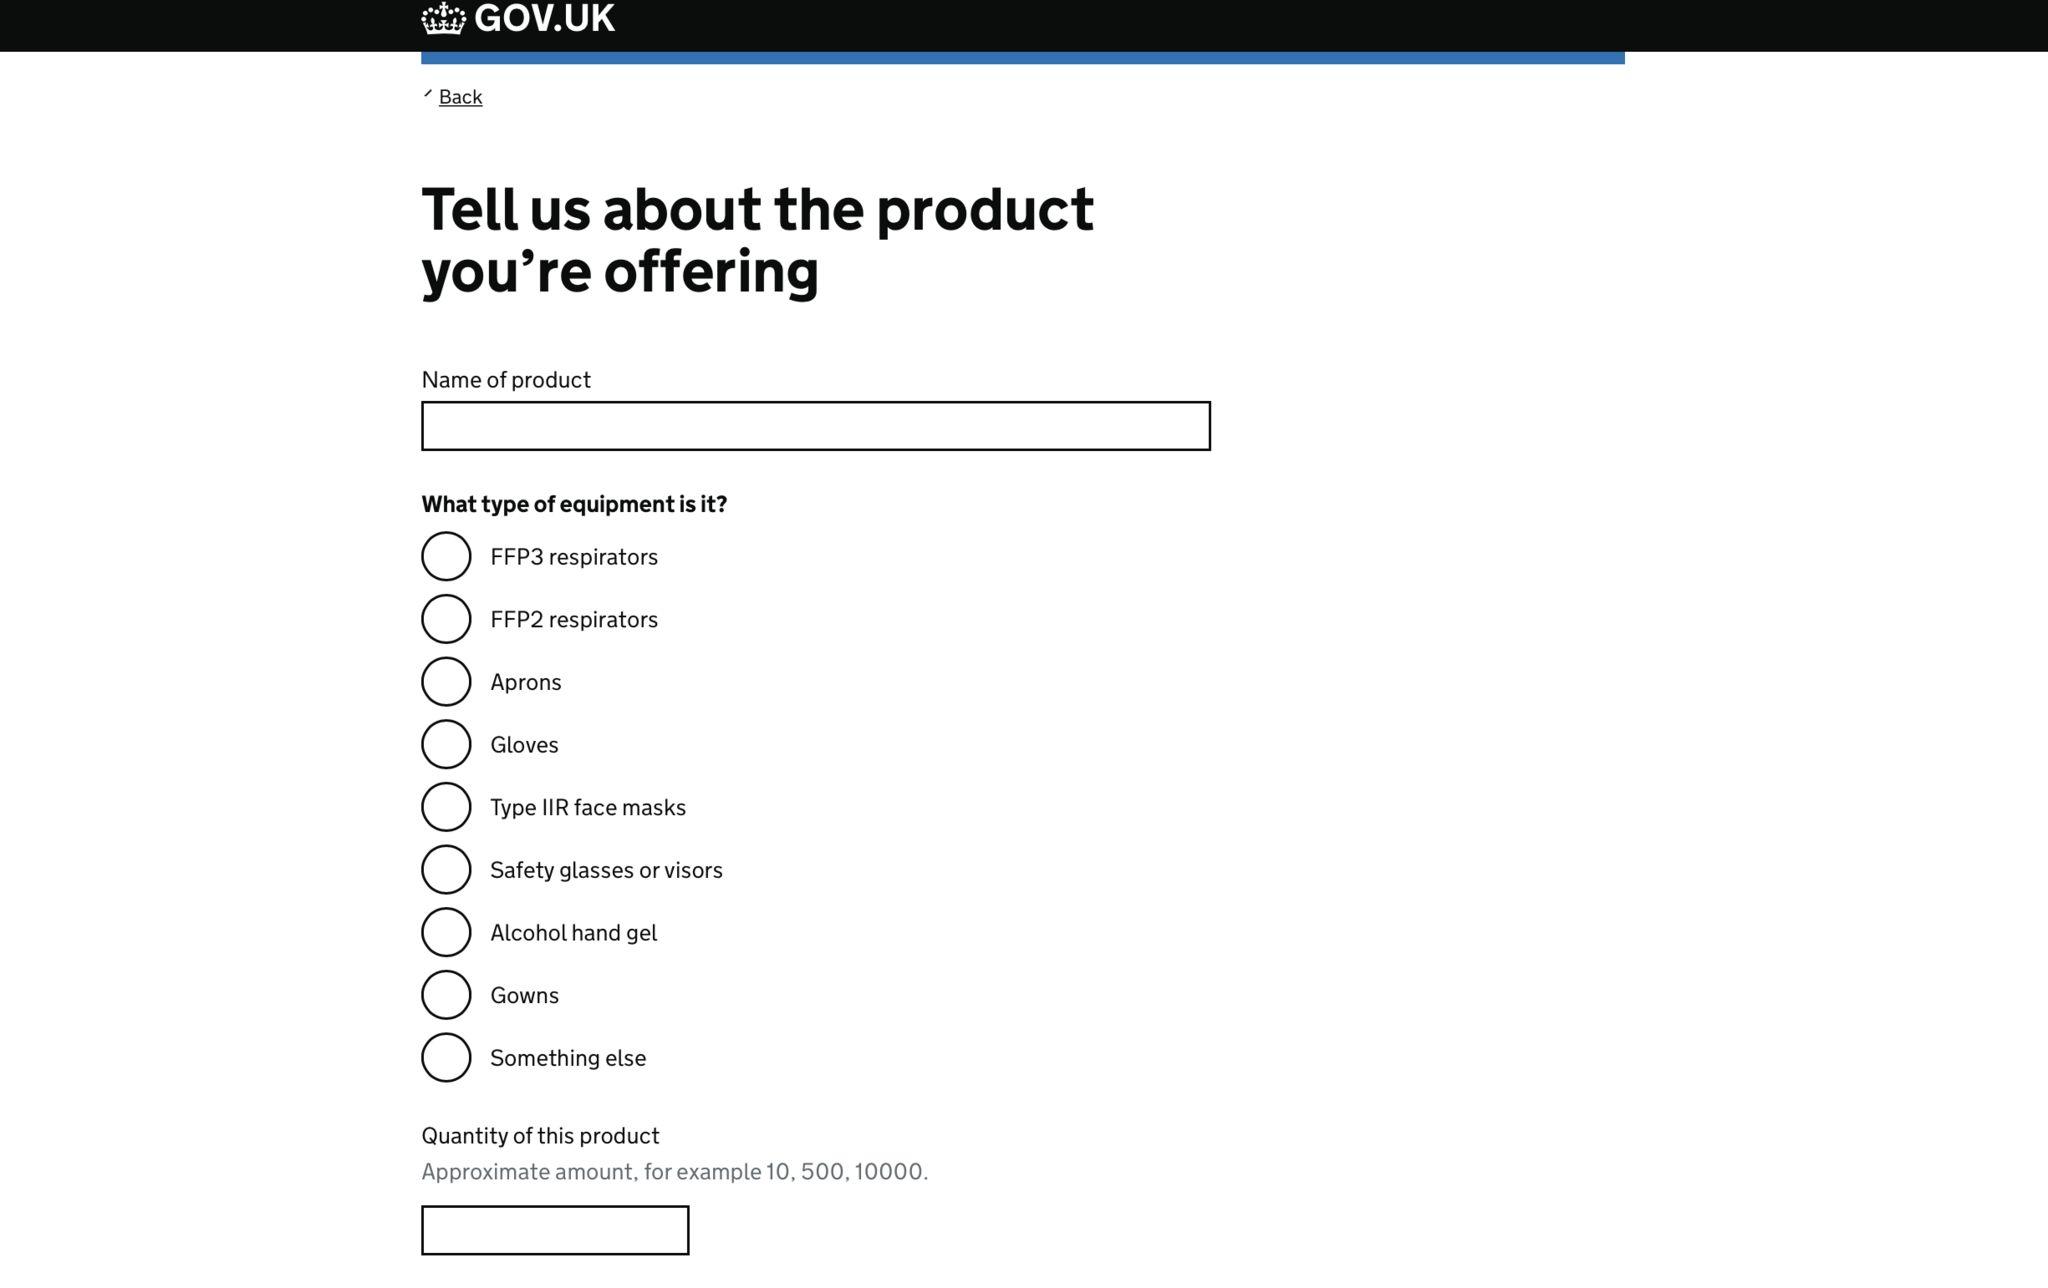 Screenshot of the online survey